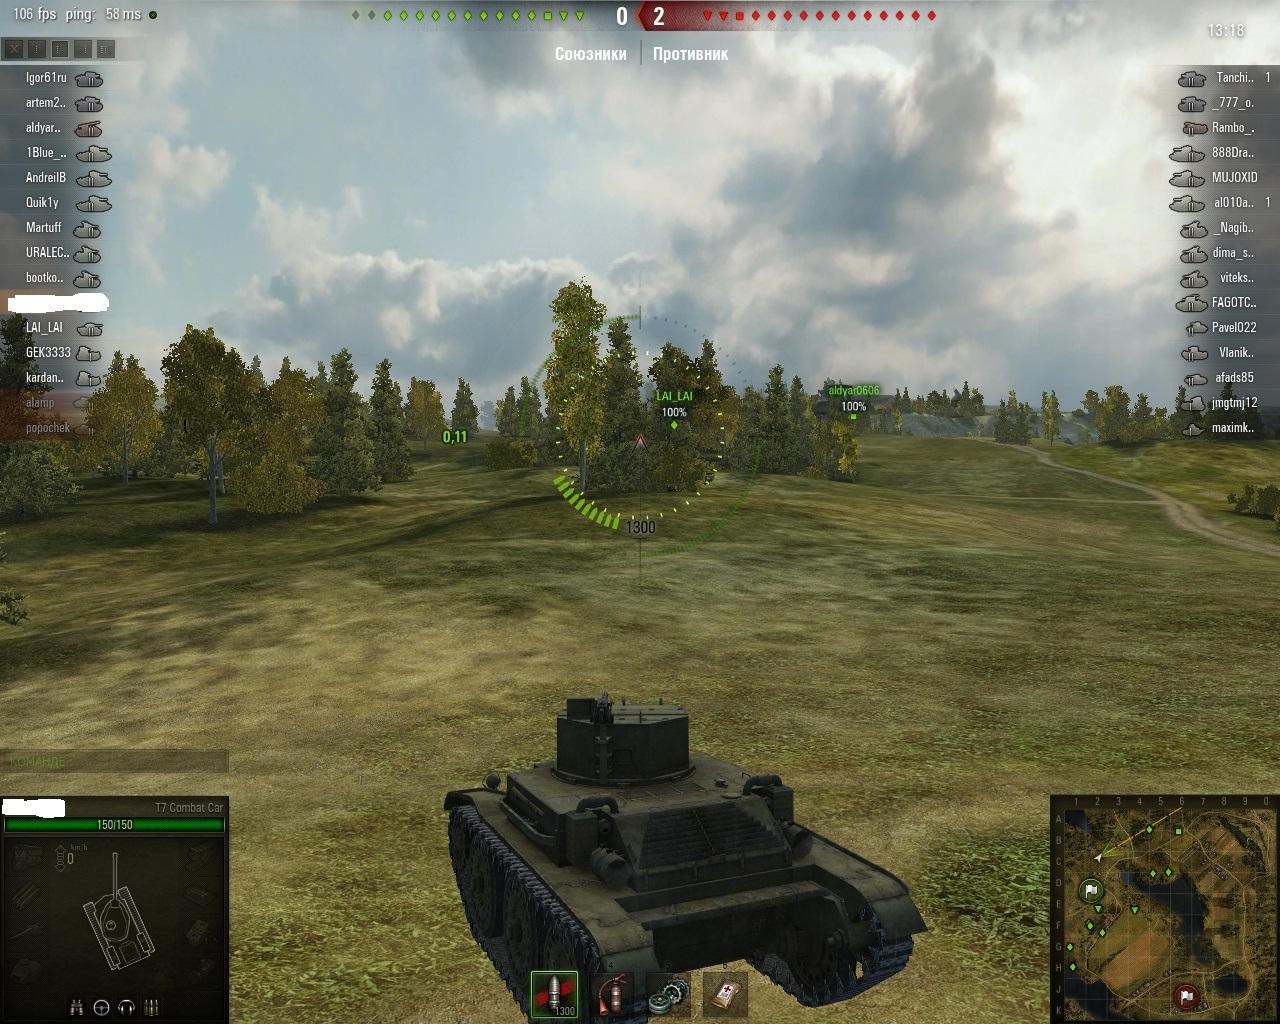 tanks | World of Tanks - Mods & cheats